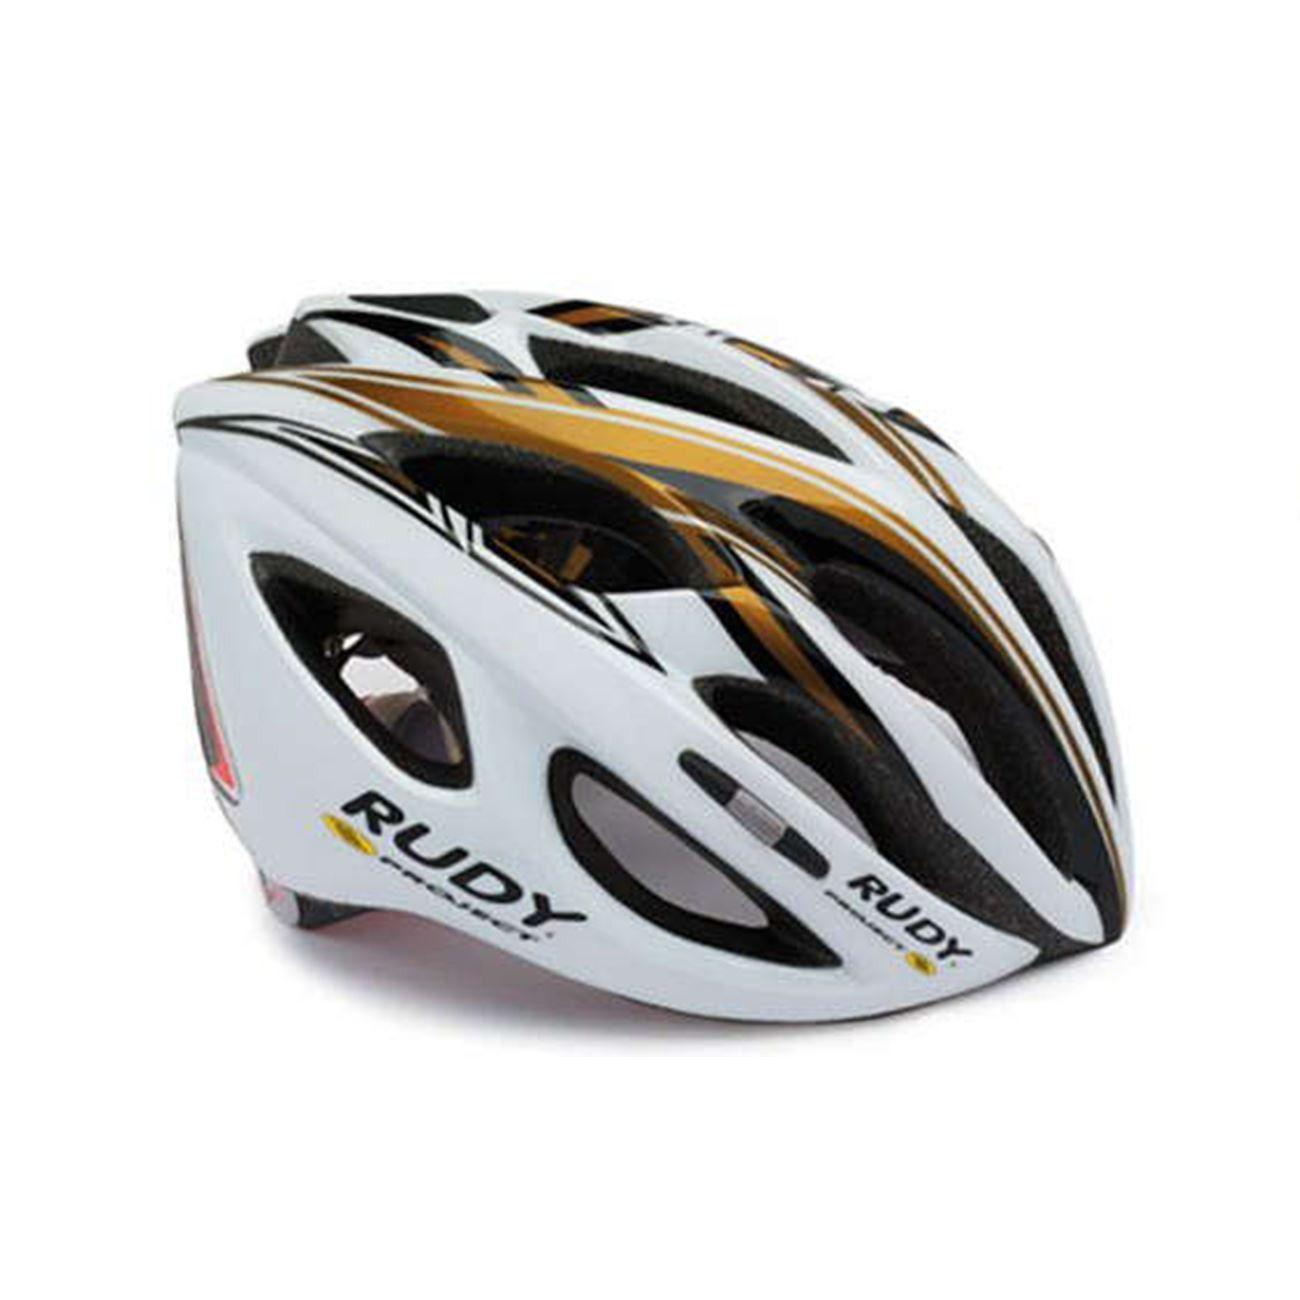 Capacete Bike Rudy Slinger Tam S-m 54-58